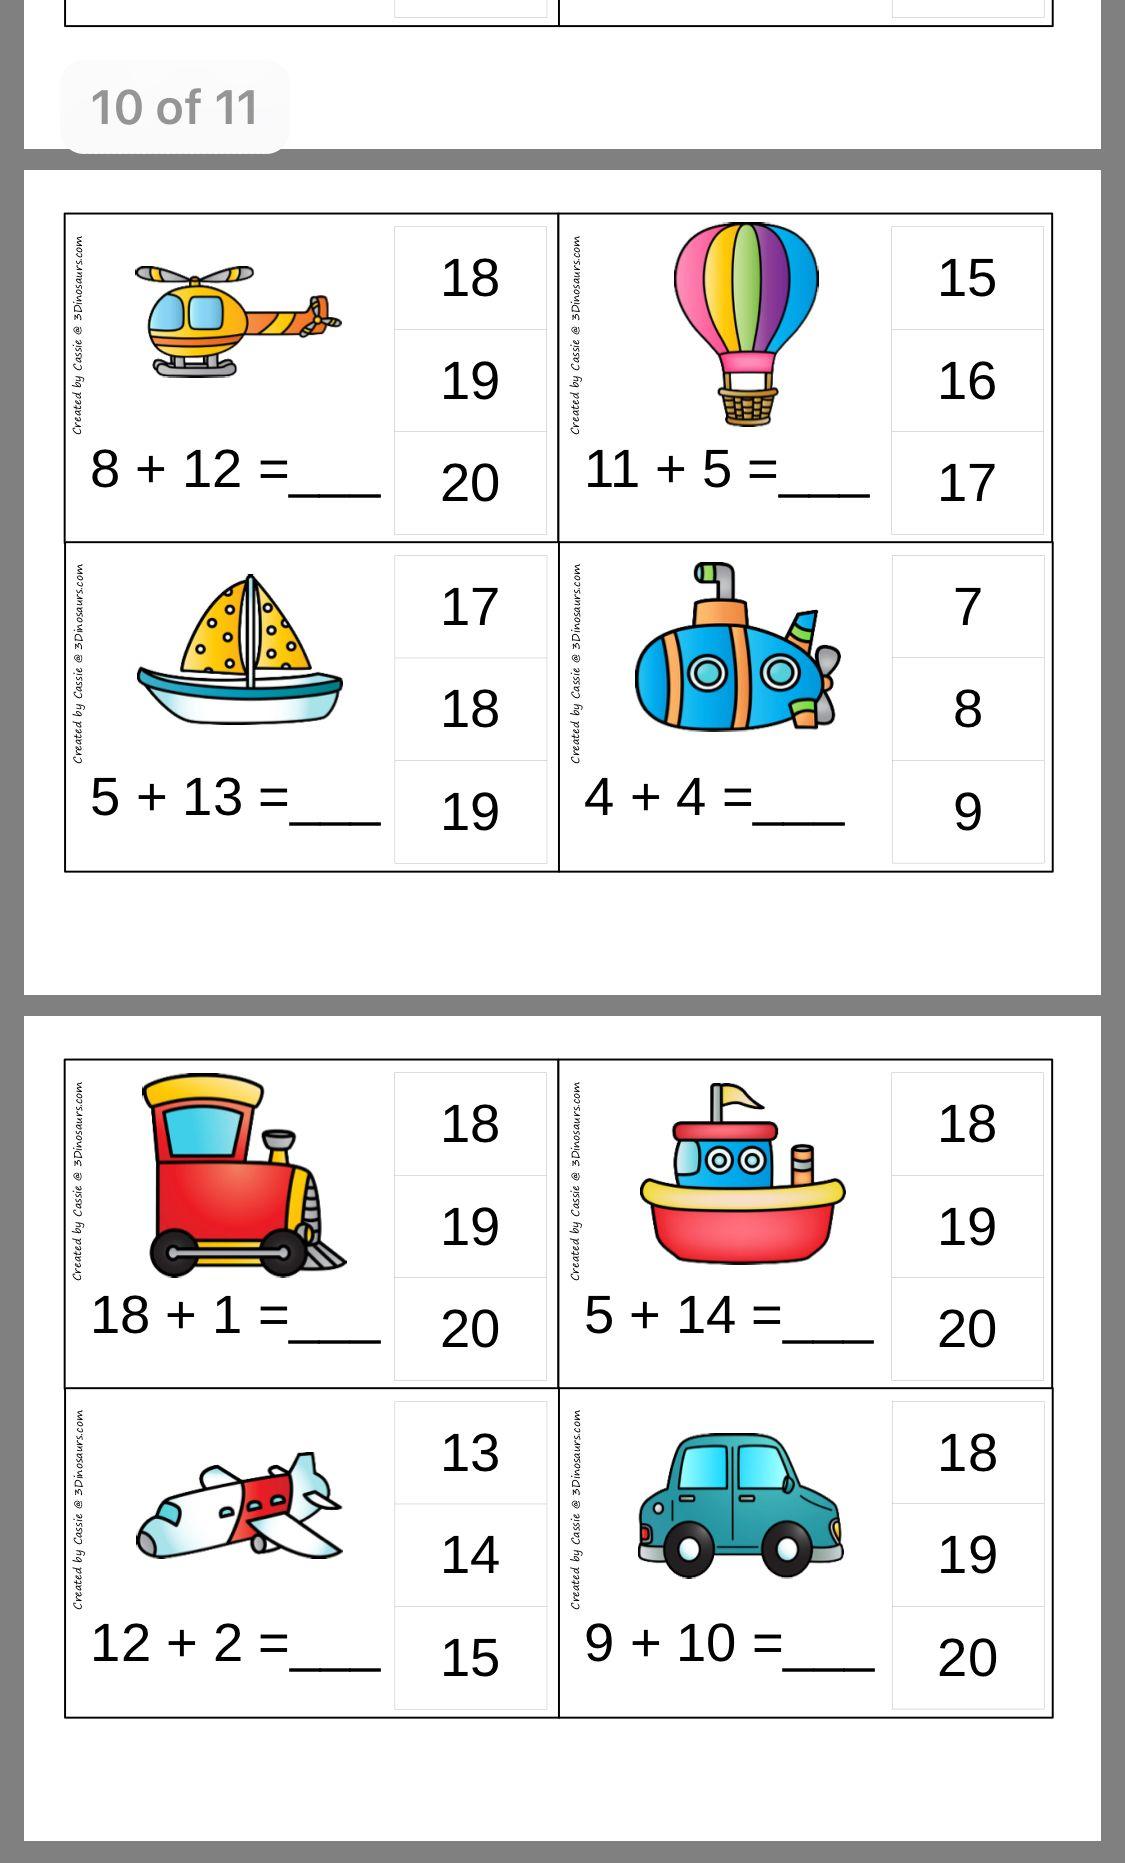 Ispolzovala S In 2020 Preschool Math Worksheets Kids Math Worksheets Kindergarten Math Worksheets [ 1863 x 1125 Pixel ]